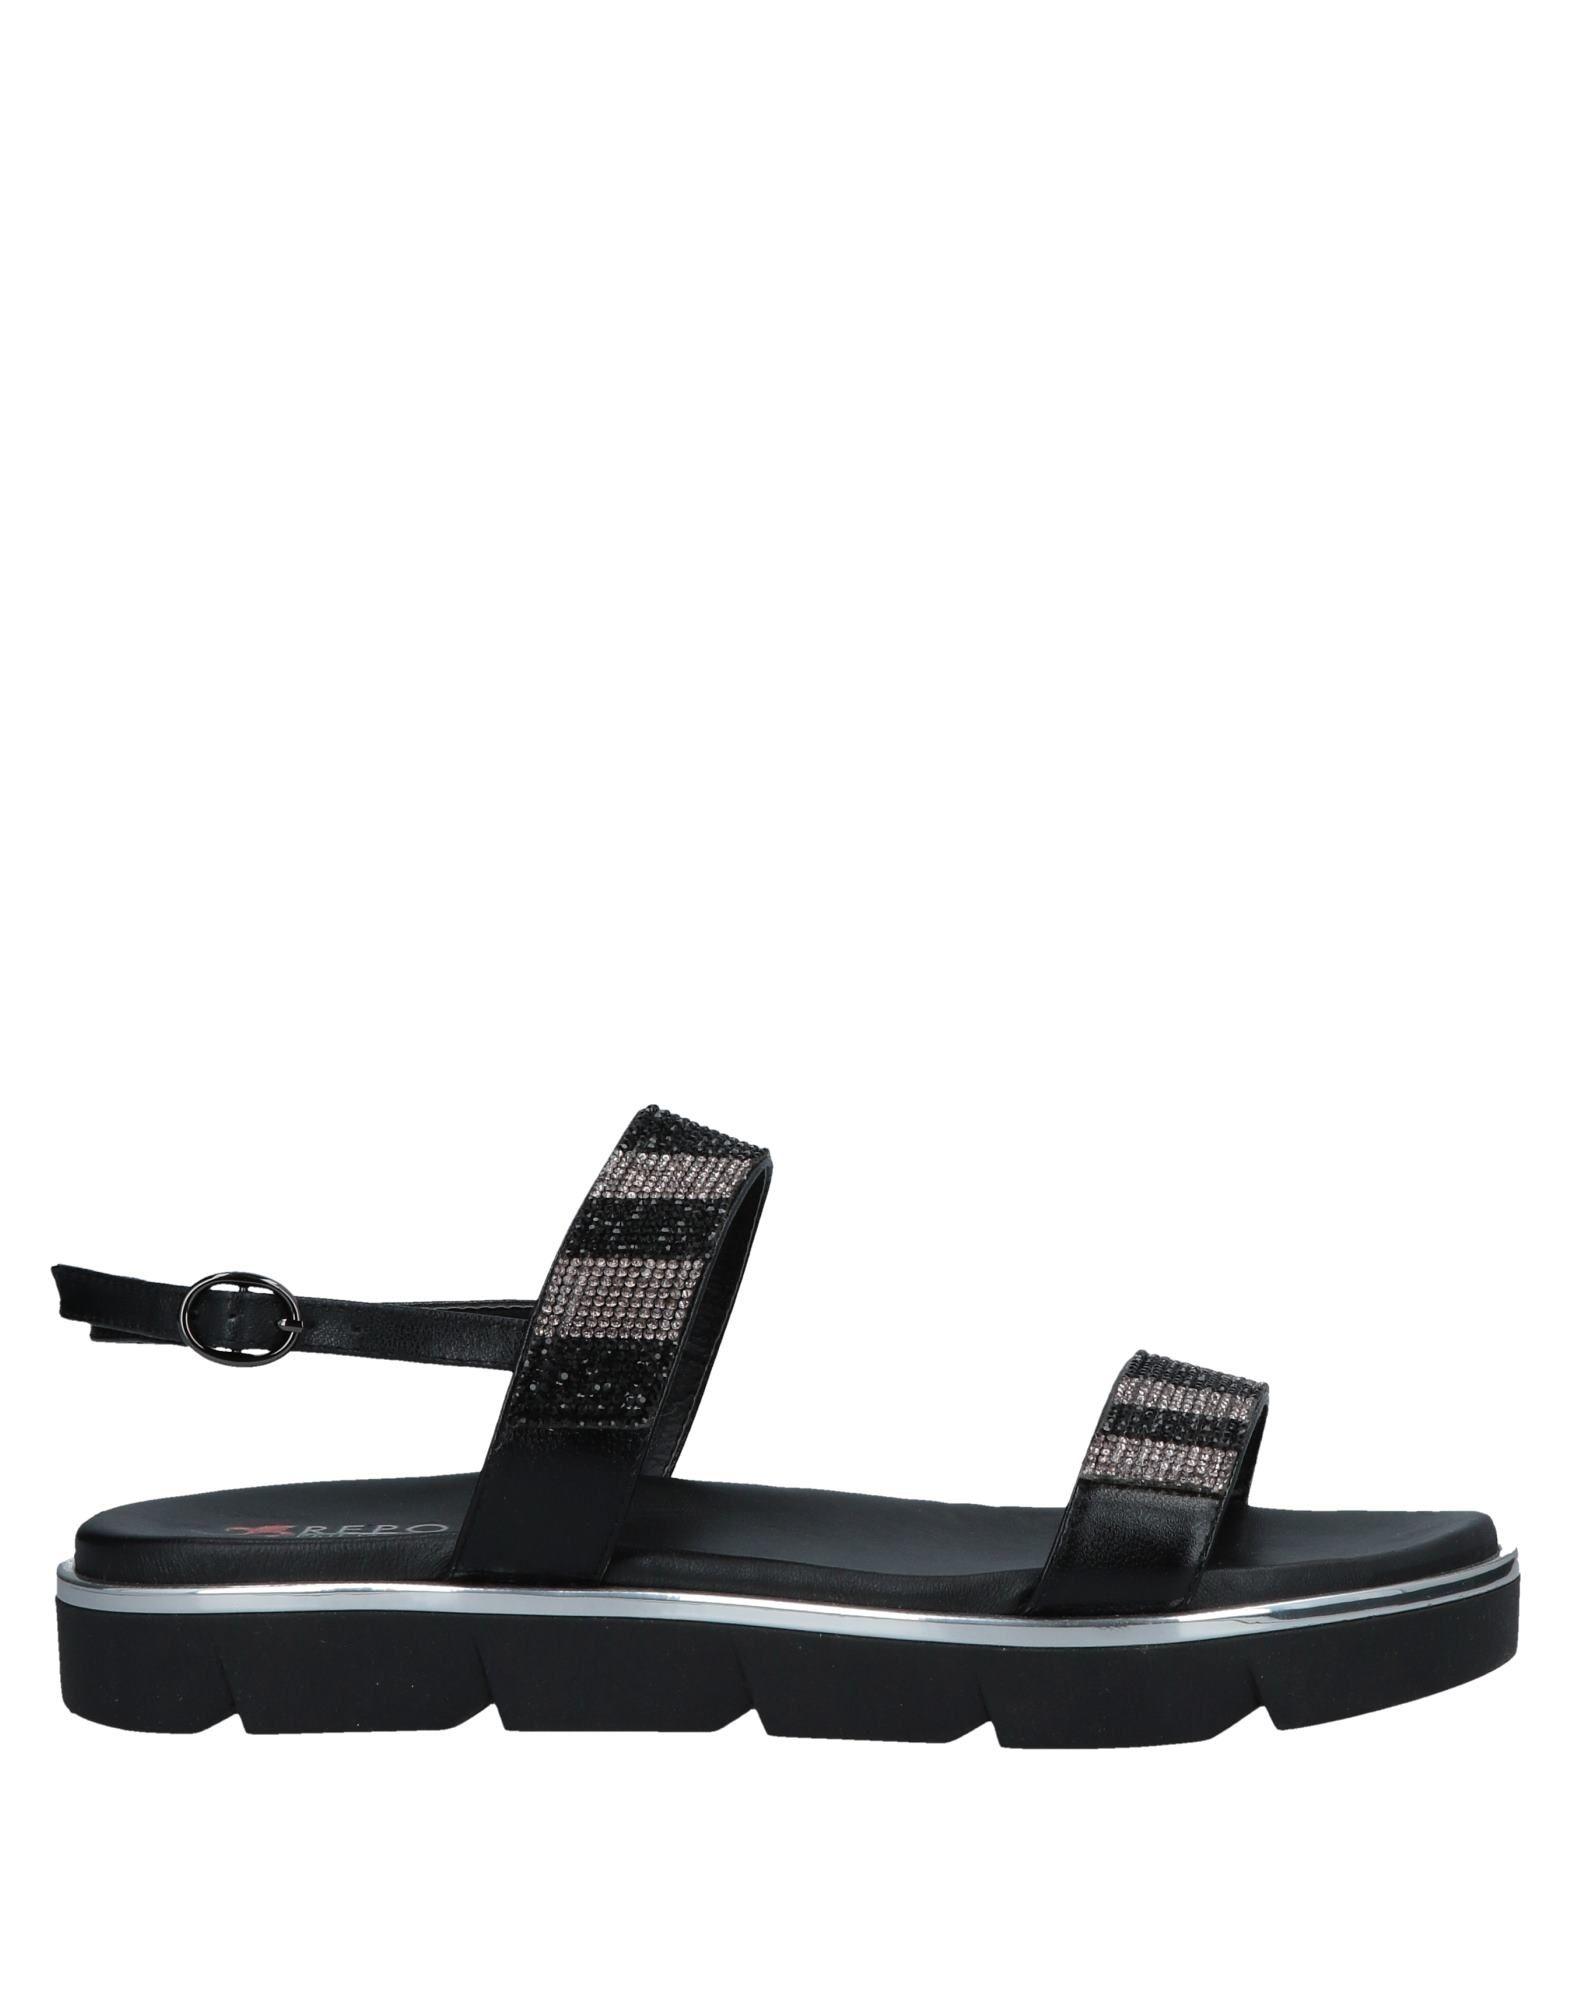 PHIL GATIÈR by REPO Сандалии size 34 43 new 2016 low heel flats women s sandals flip flops women sandals spring summer ladies shoes woman good y0502217f